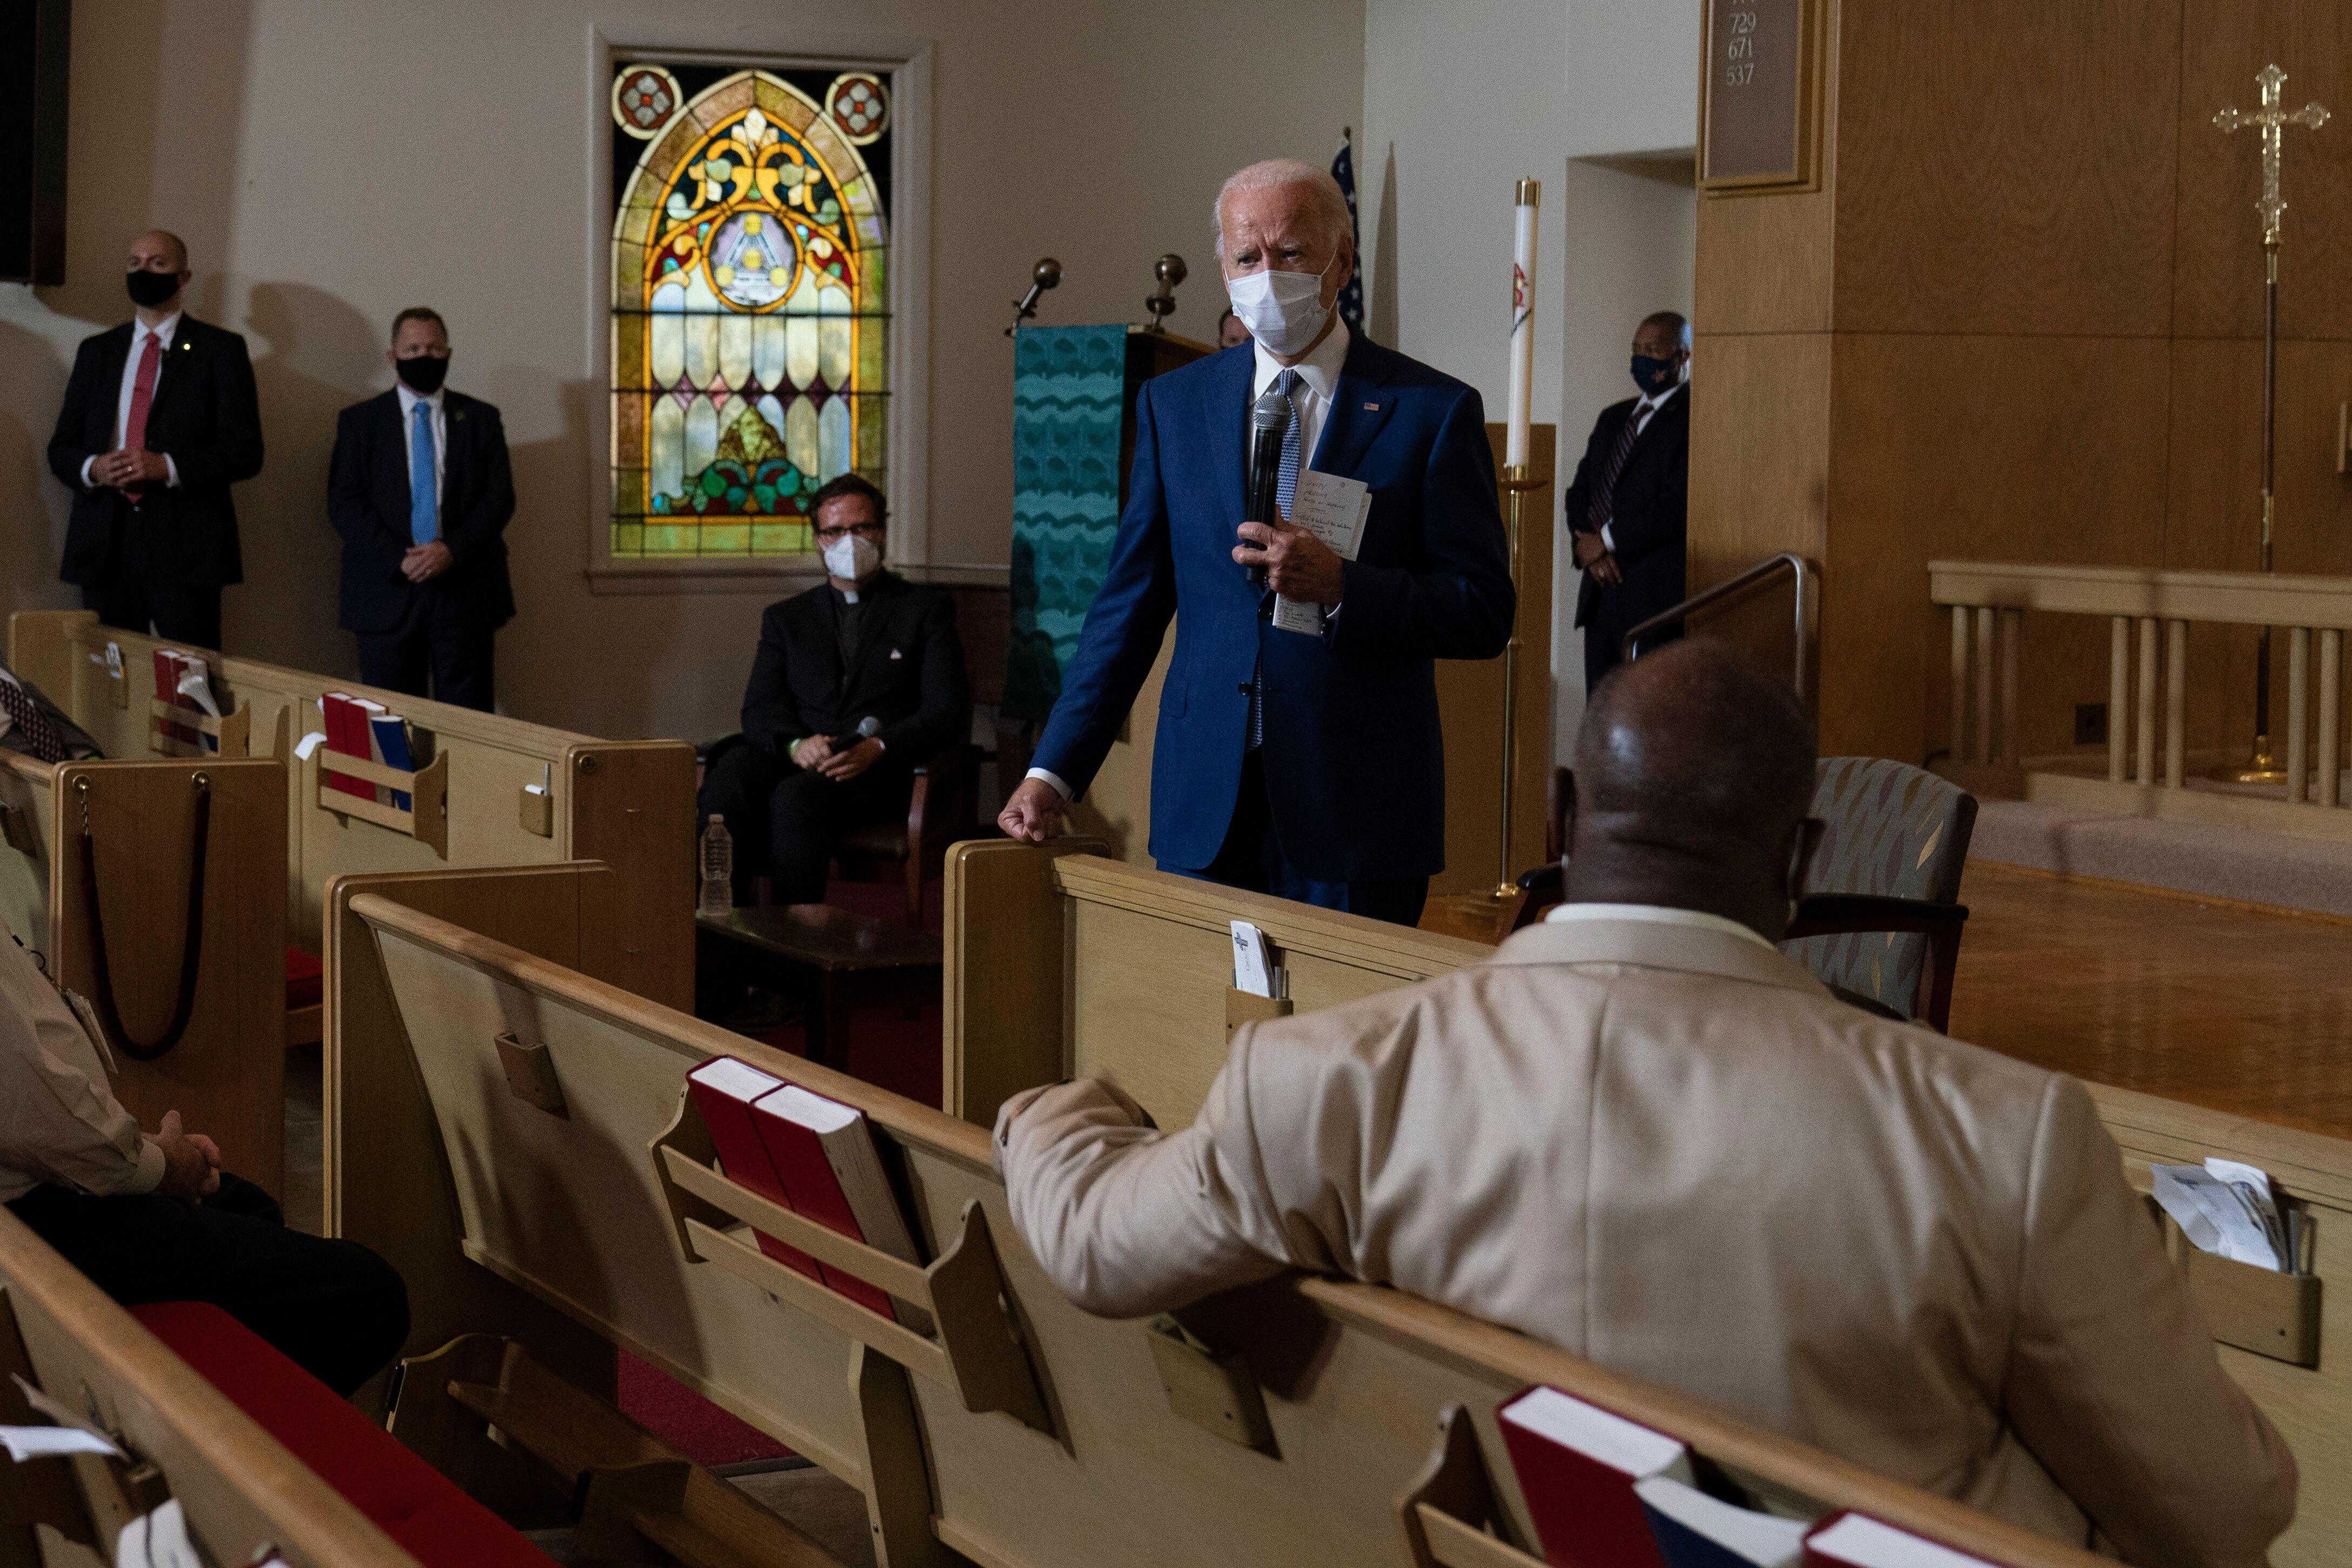 Biden speaks during a community event at Grace Lutheran Church in Kenosha on Sept. 3.